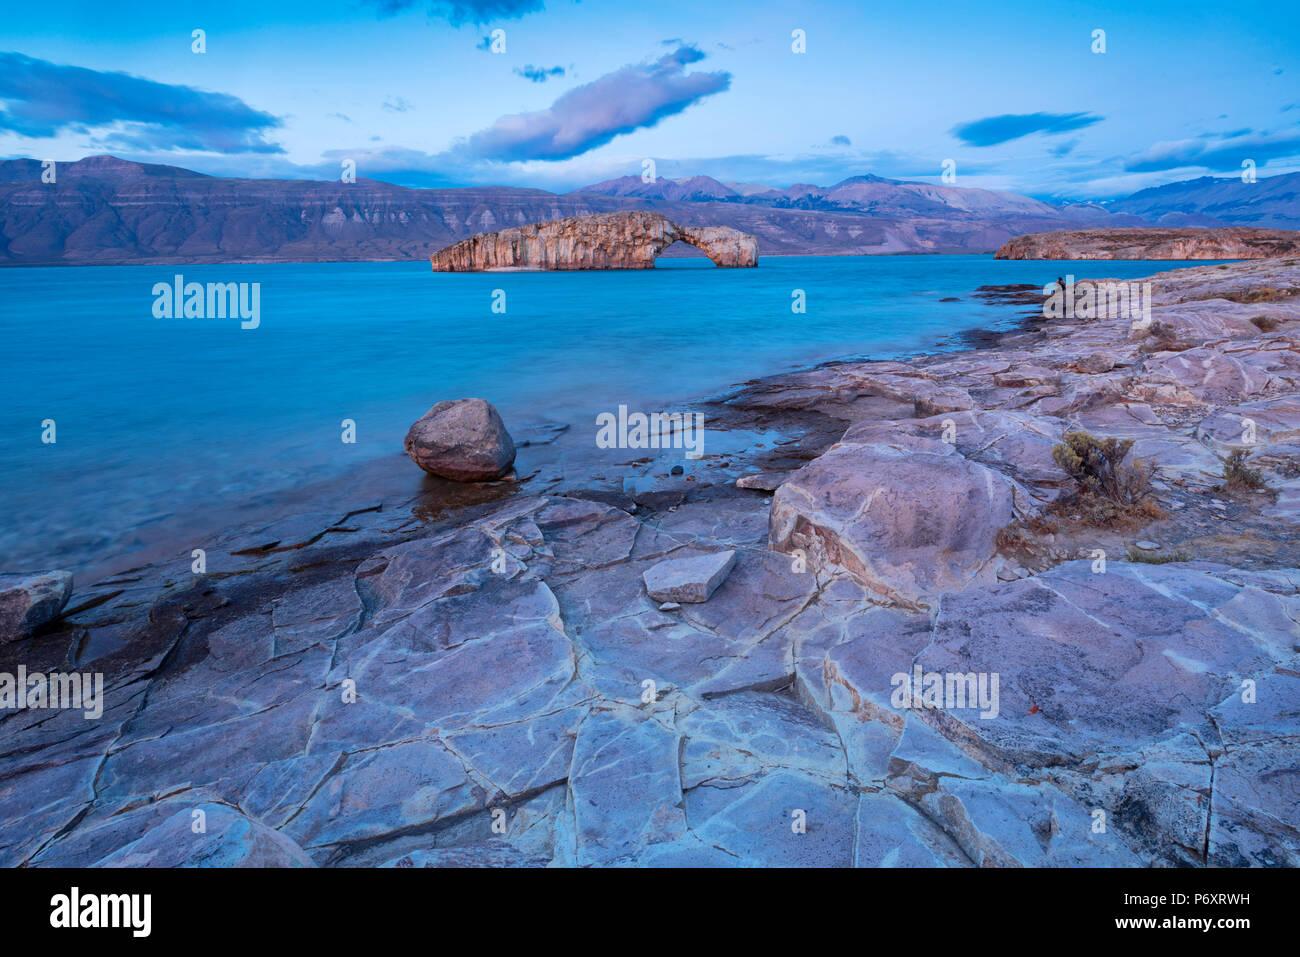 South America, Argentina, Santa Cruz, Patagonia, Lago Posadas - Stock Image